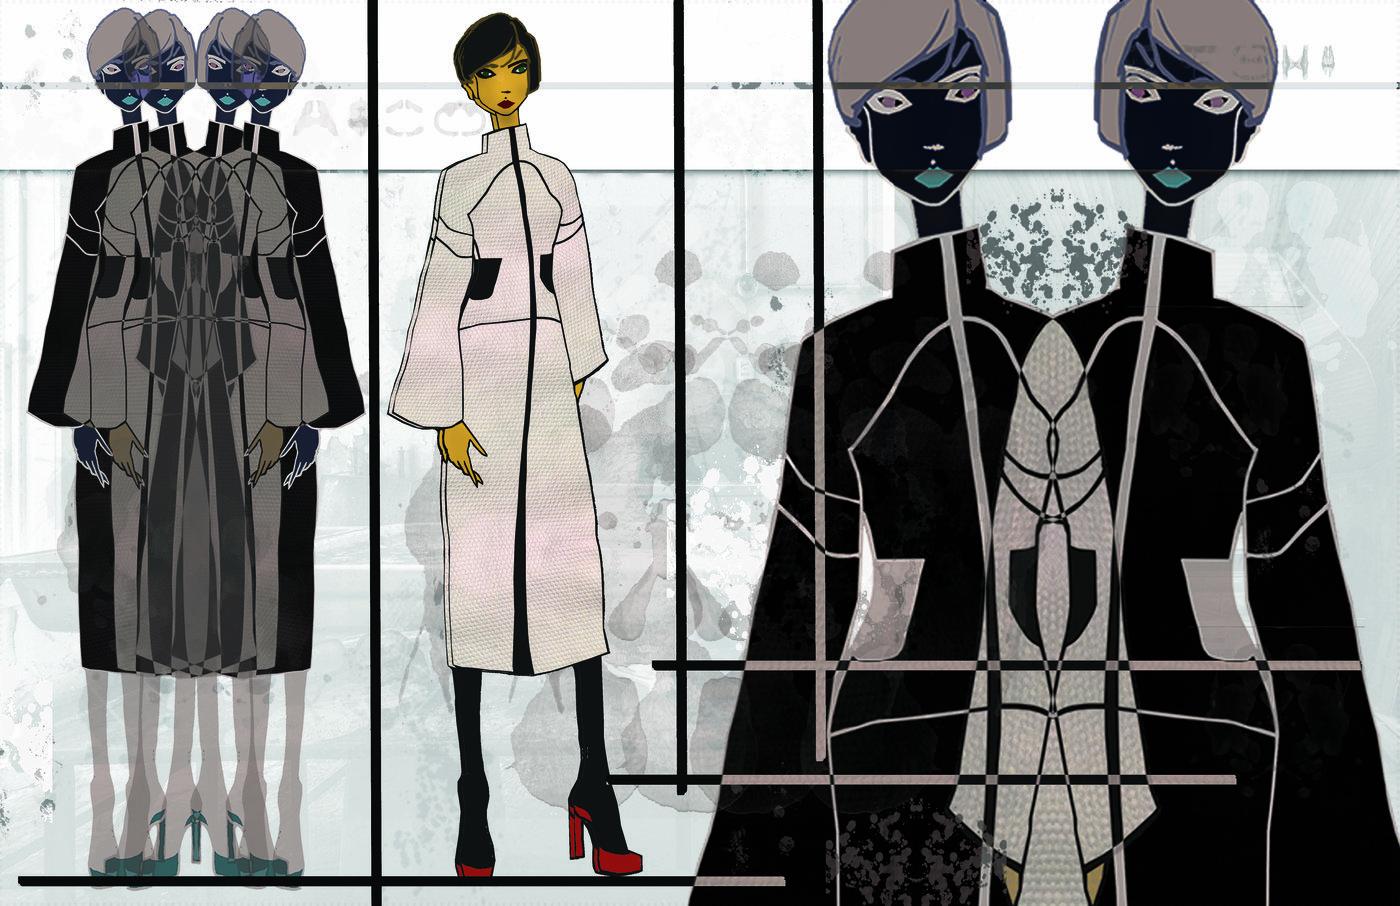 Cad Design Fashion Graphic Design Portfolio By Arabelis Griffin At Coroflot Com